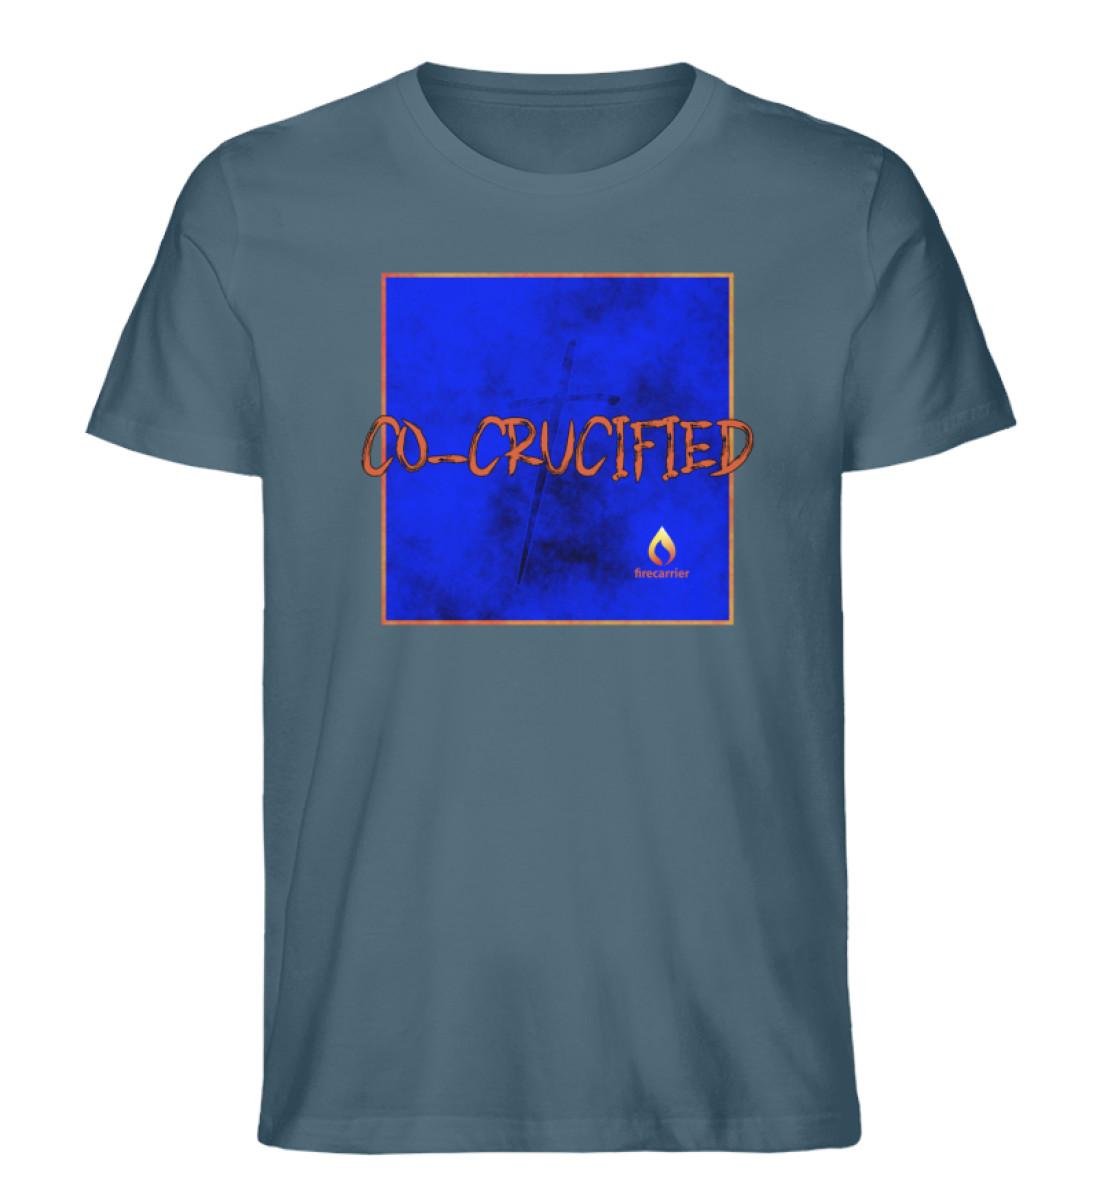 cocrucified - Men Premium Organic Shirt-6880